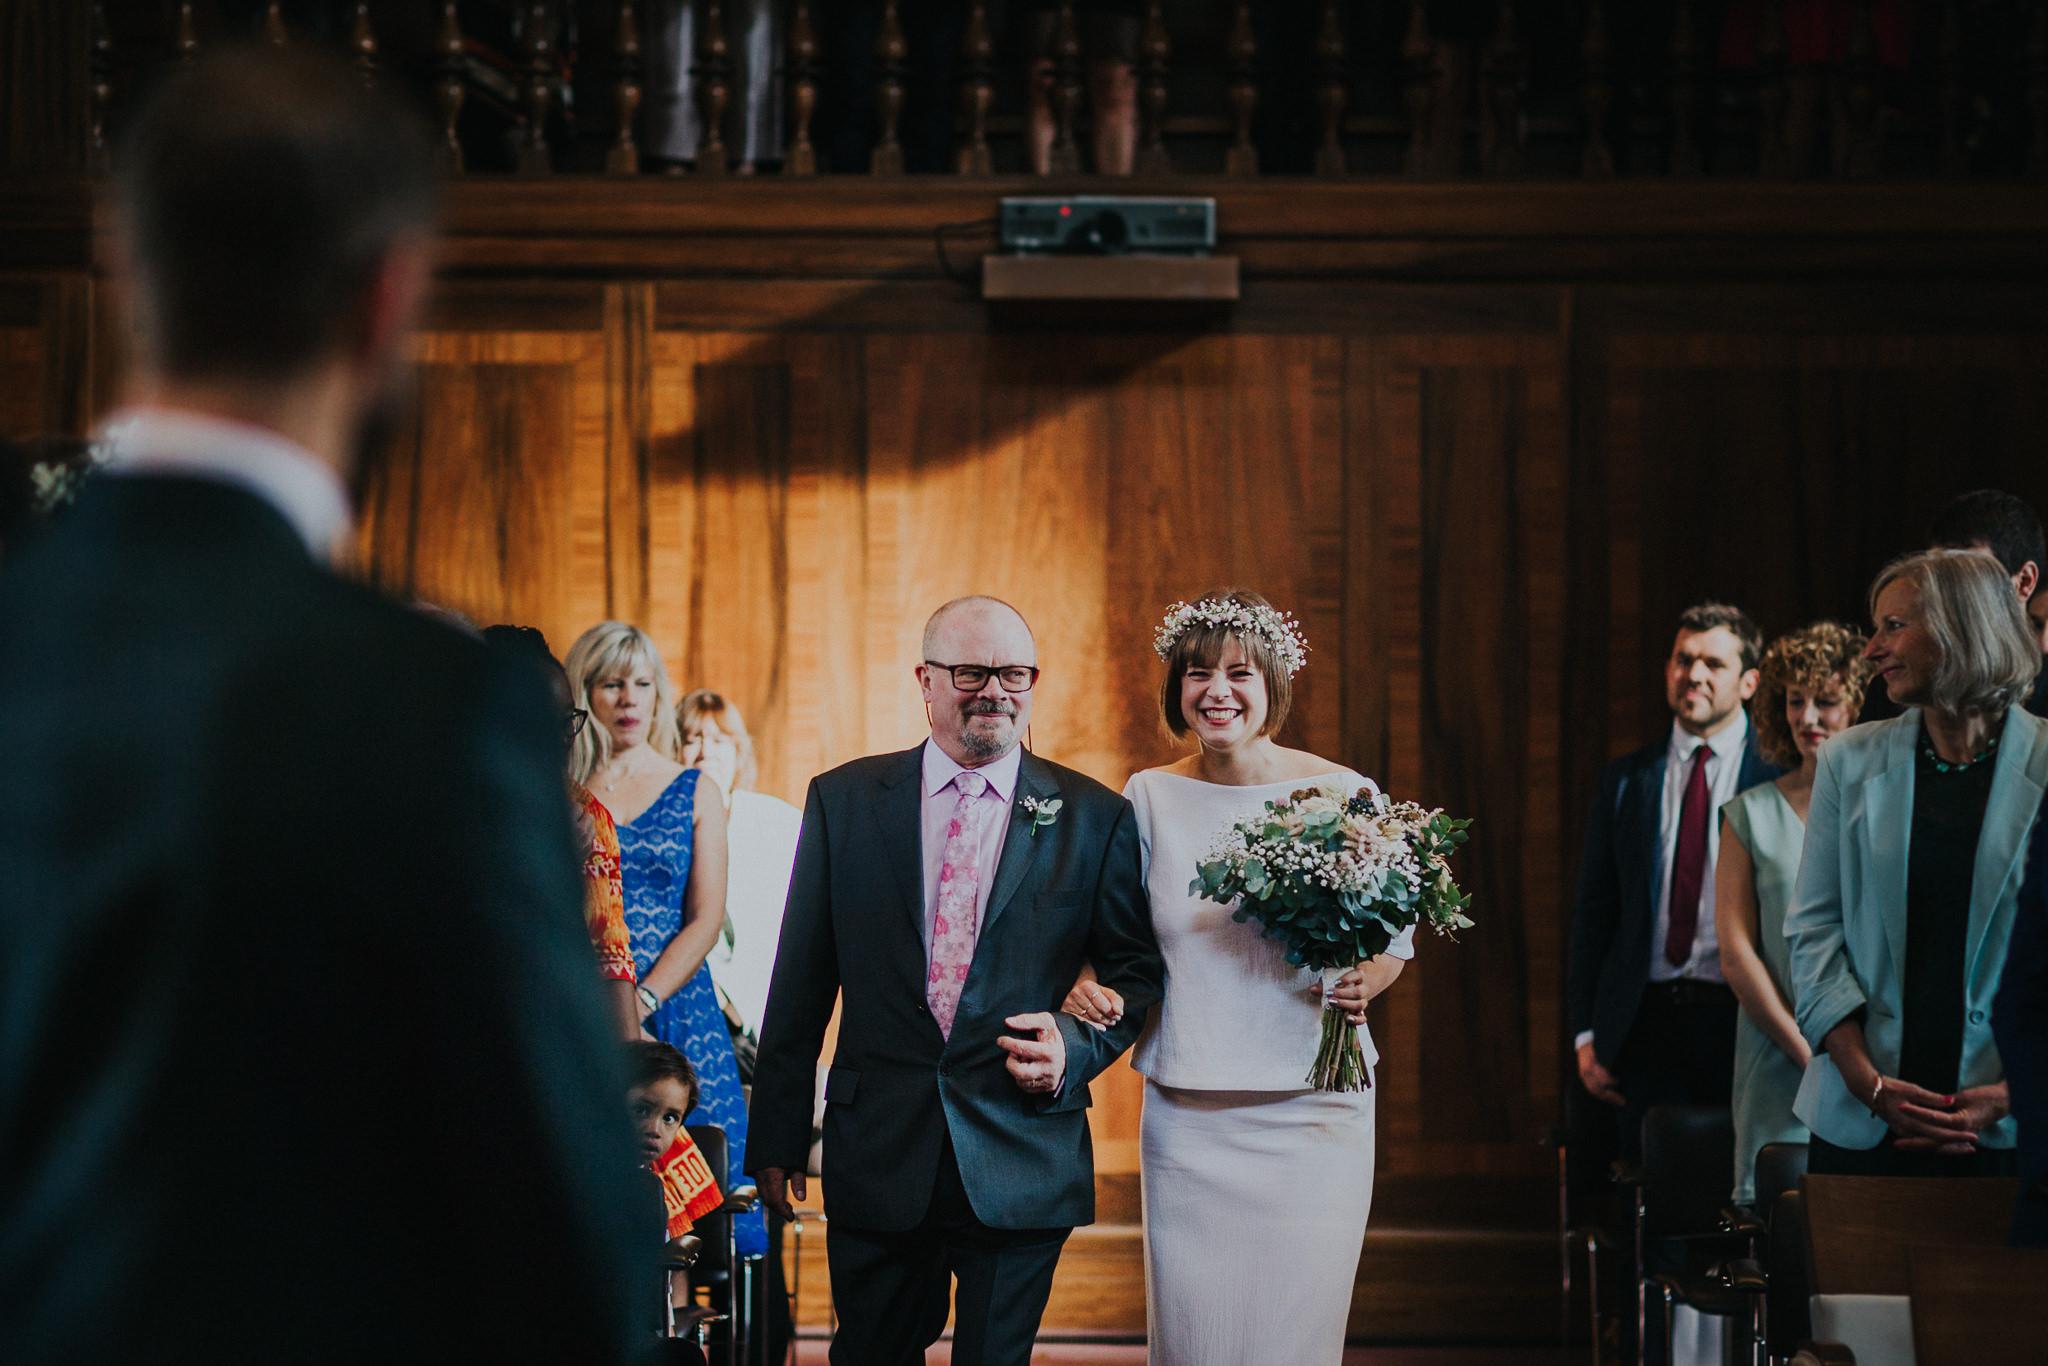 kate-gray-london-wedding-photography-22.jpg